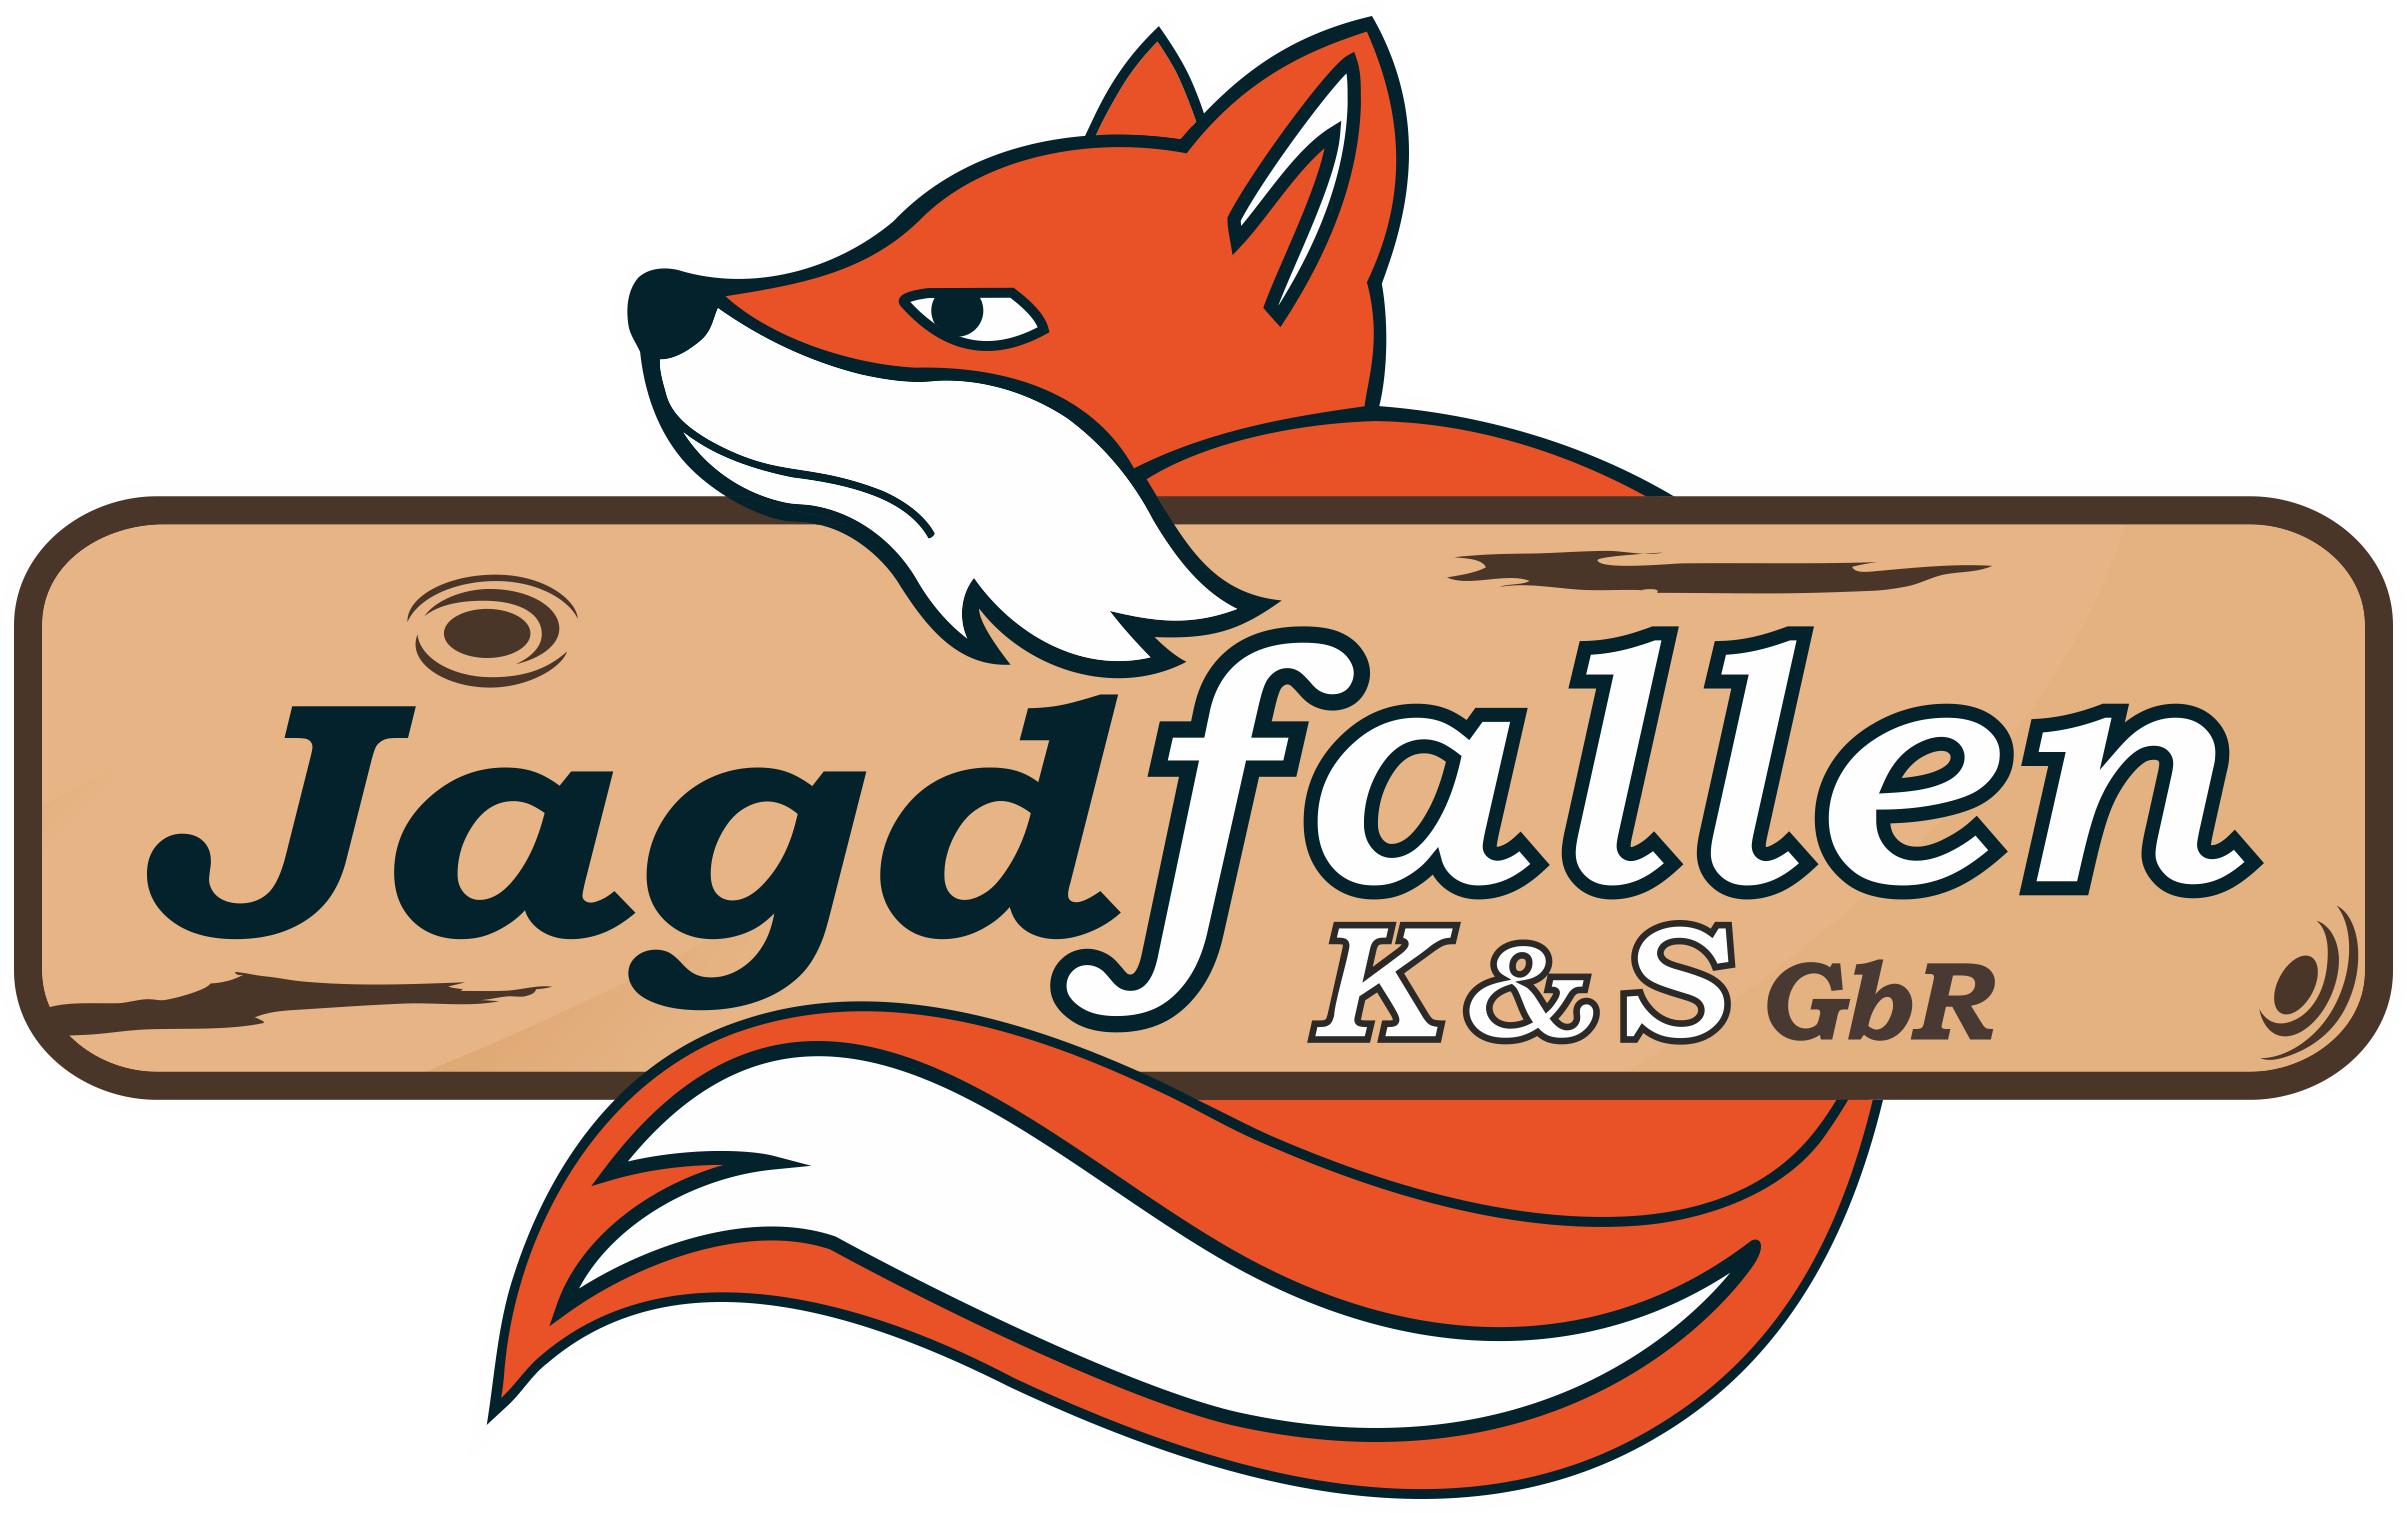 Jagdfallen Kuhnt & Steingraf GbR